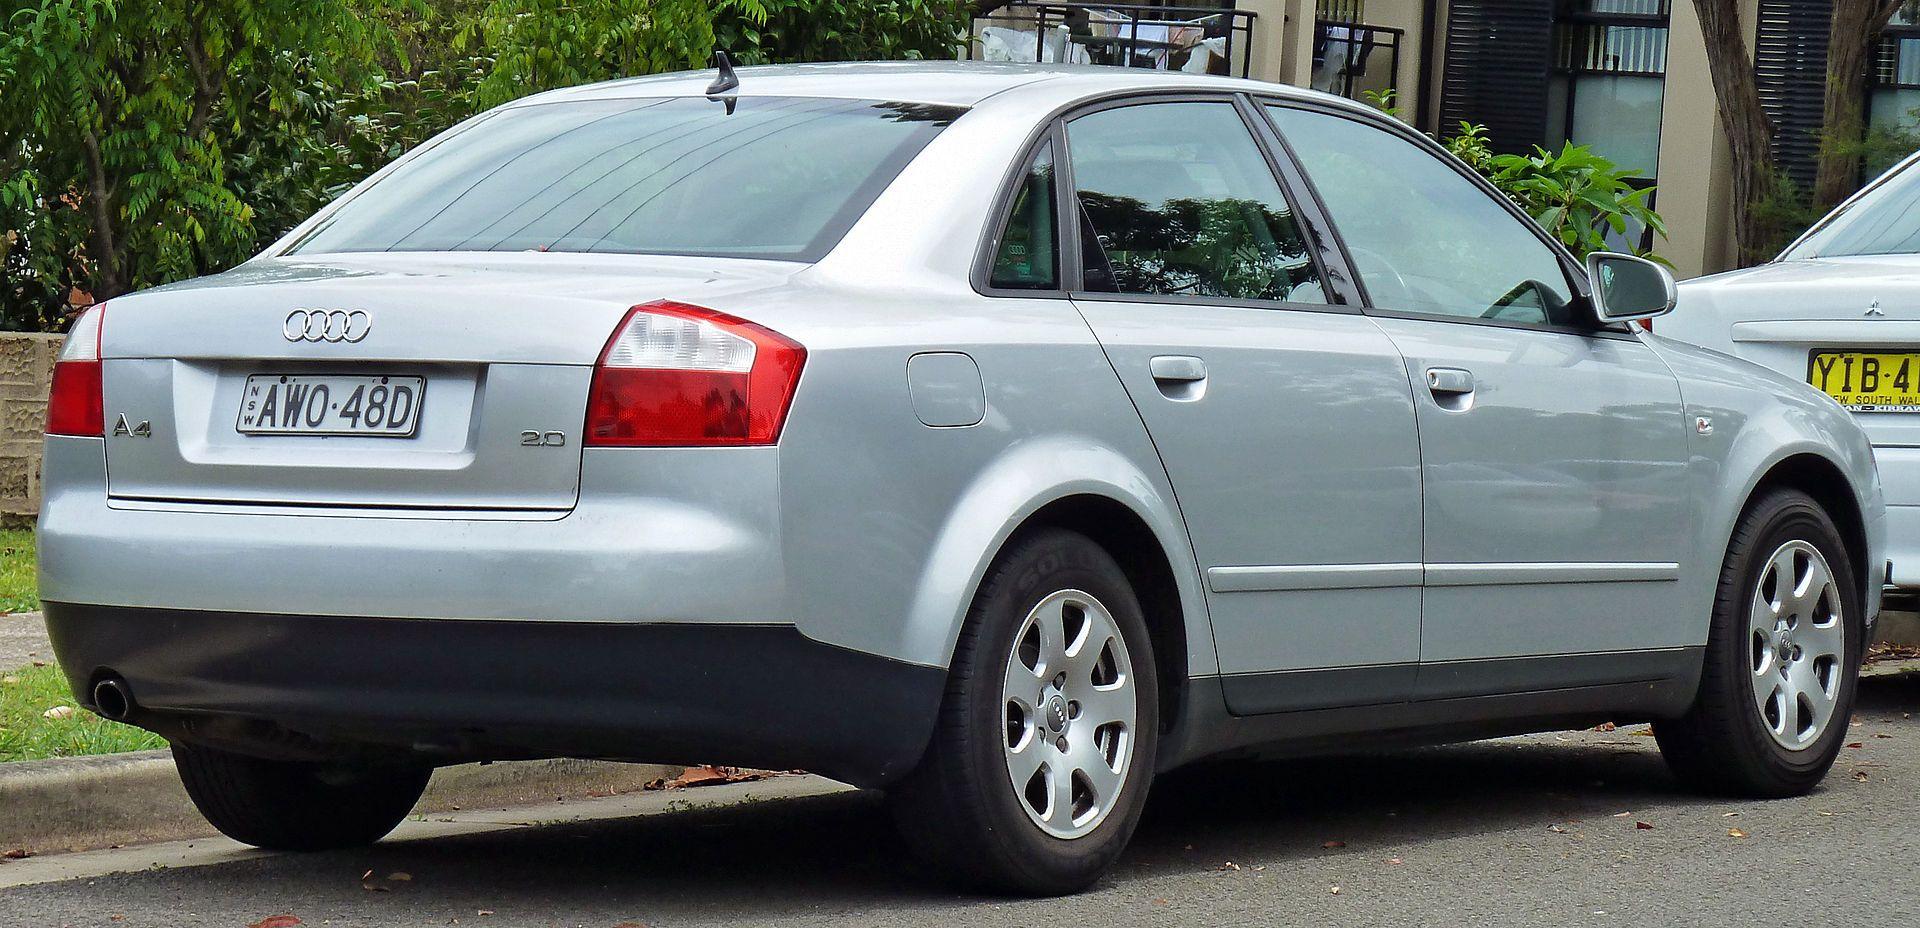 2001-2005 audi a4 (8e) 2.0 sedan 03 - audi a4 - wikipedia | audi